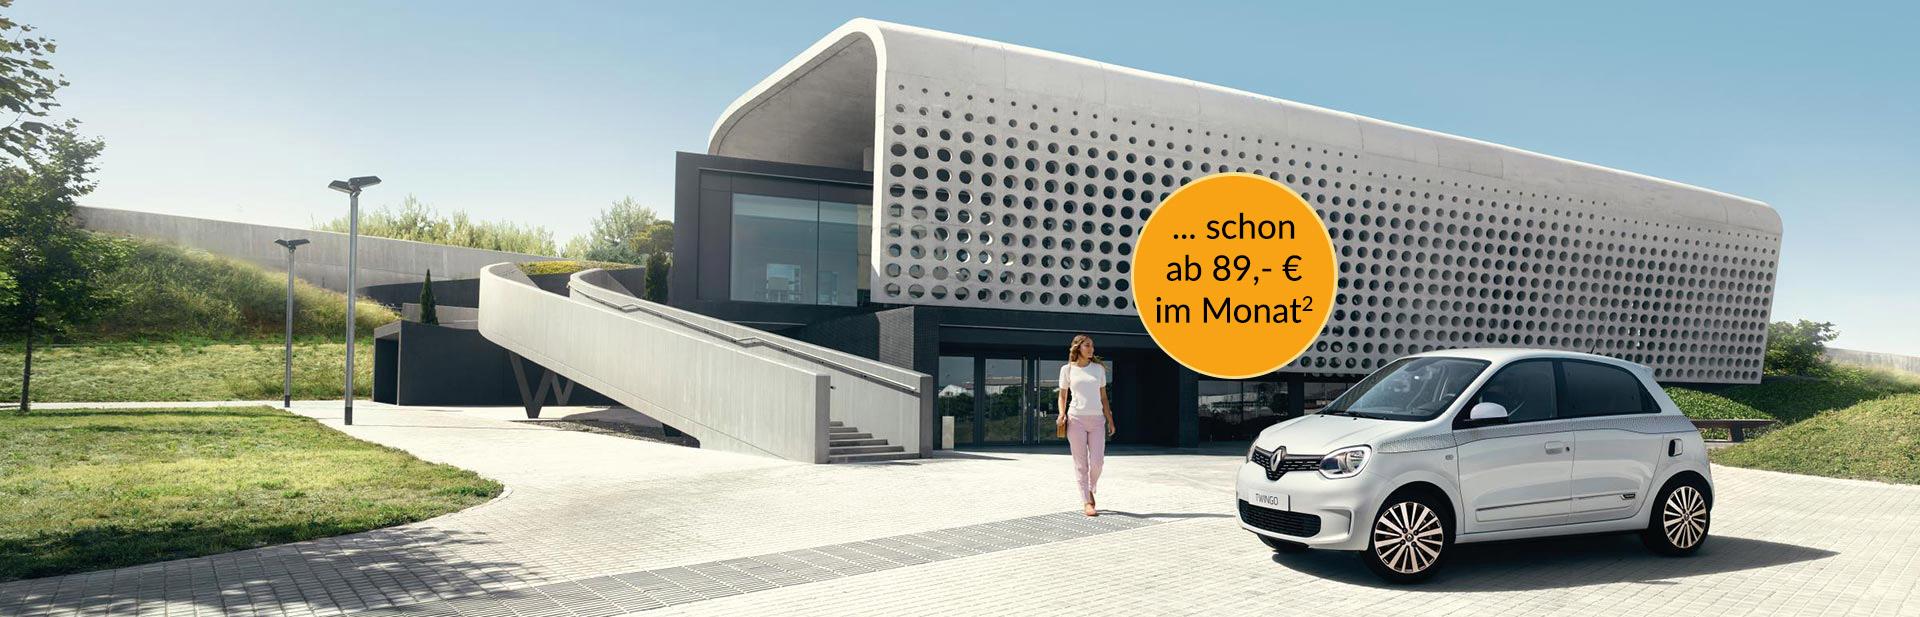 Renault Twingo schon ab 89,- € im Monat bei Autozentrum PA/Preckel